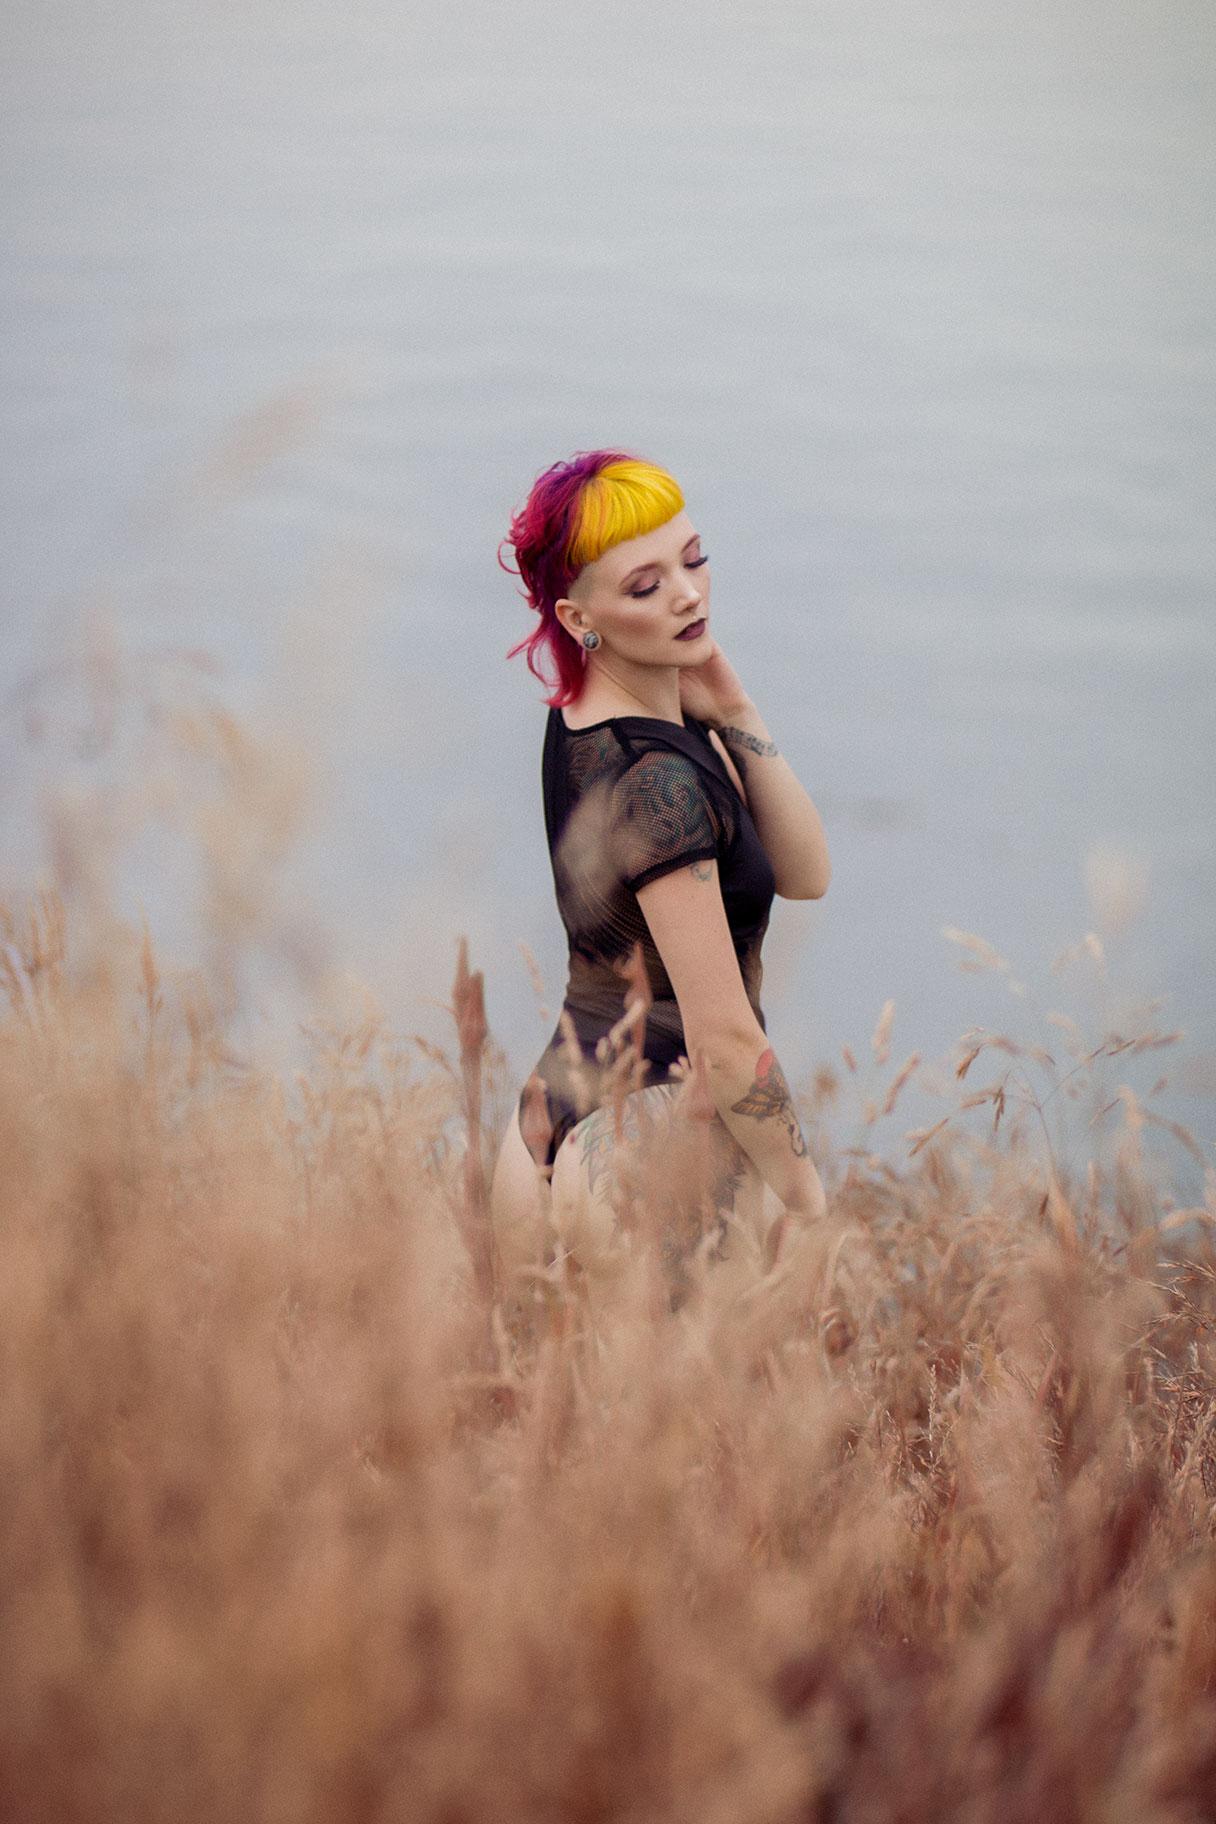 Victoria-BC-Outdoor-Boudoir-Photography-20.jpg